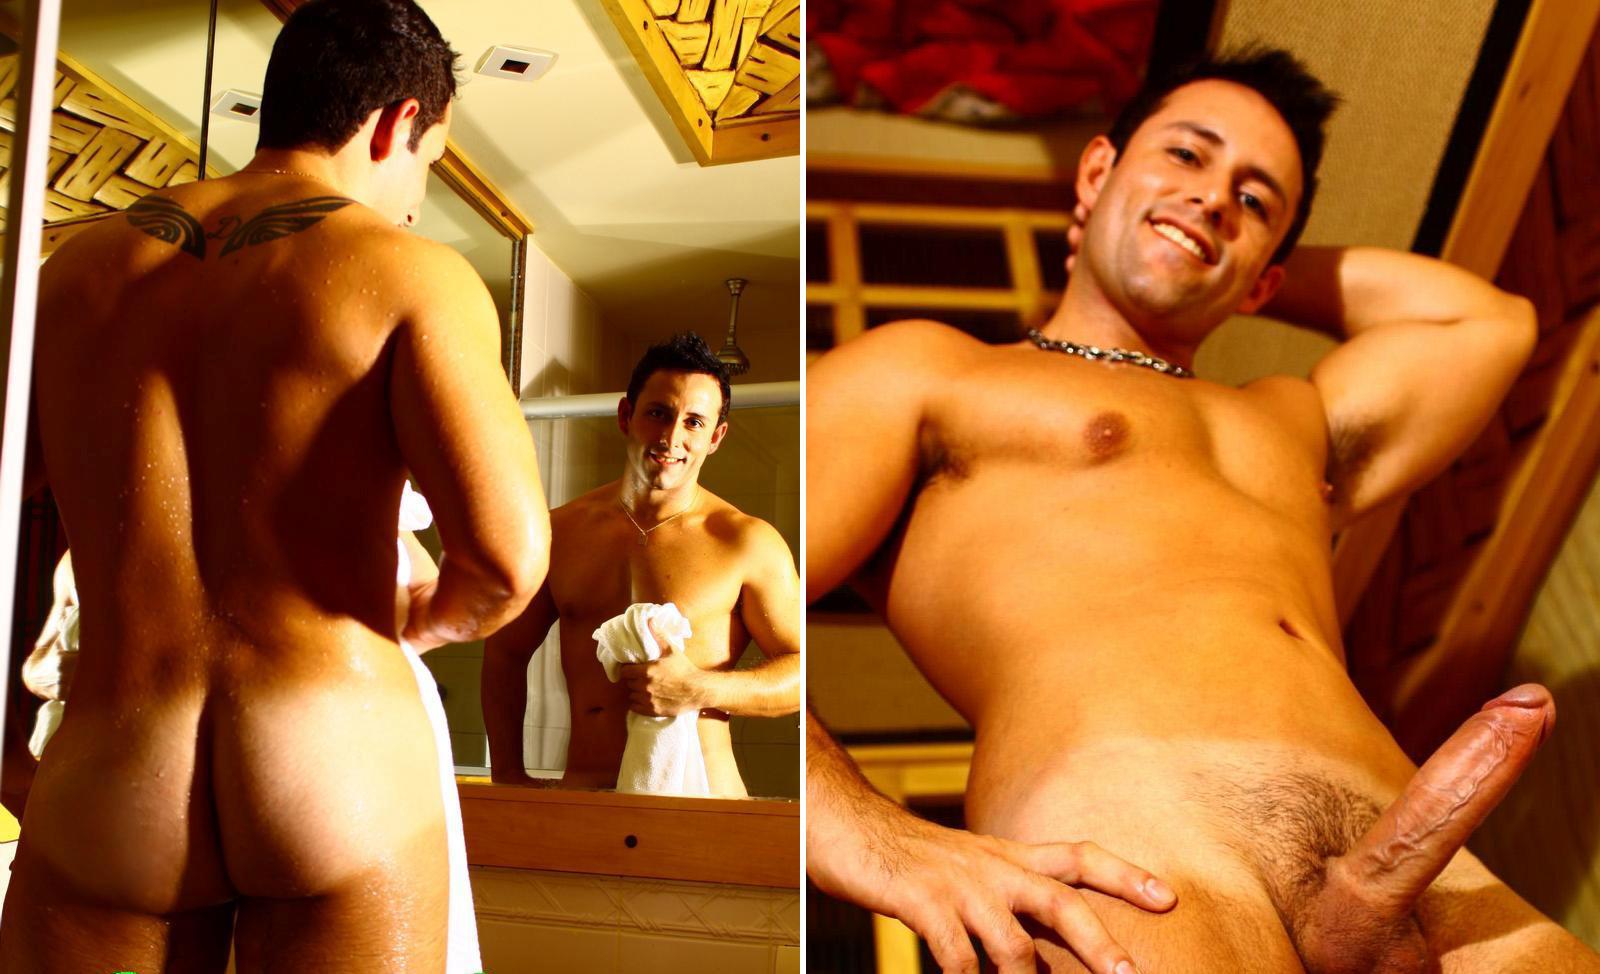 porno brasilero gay escort sao paulo